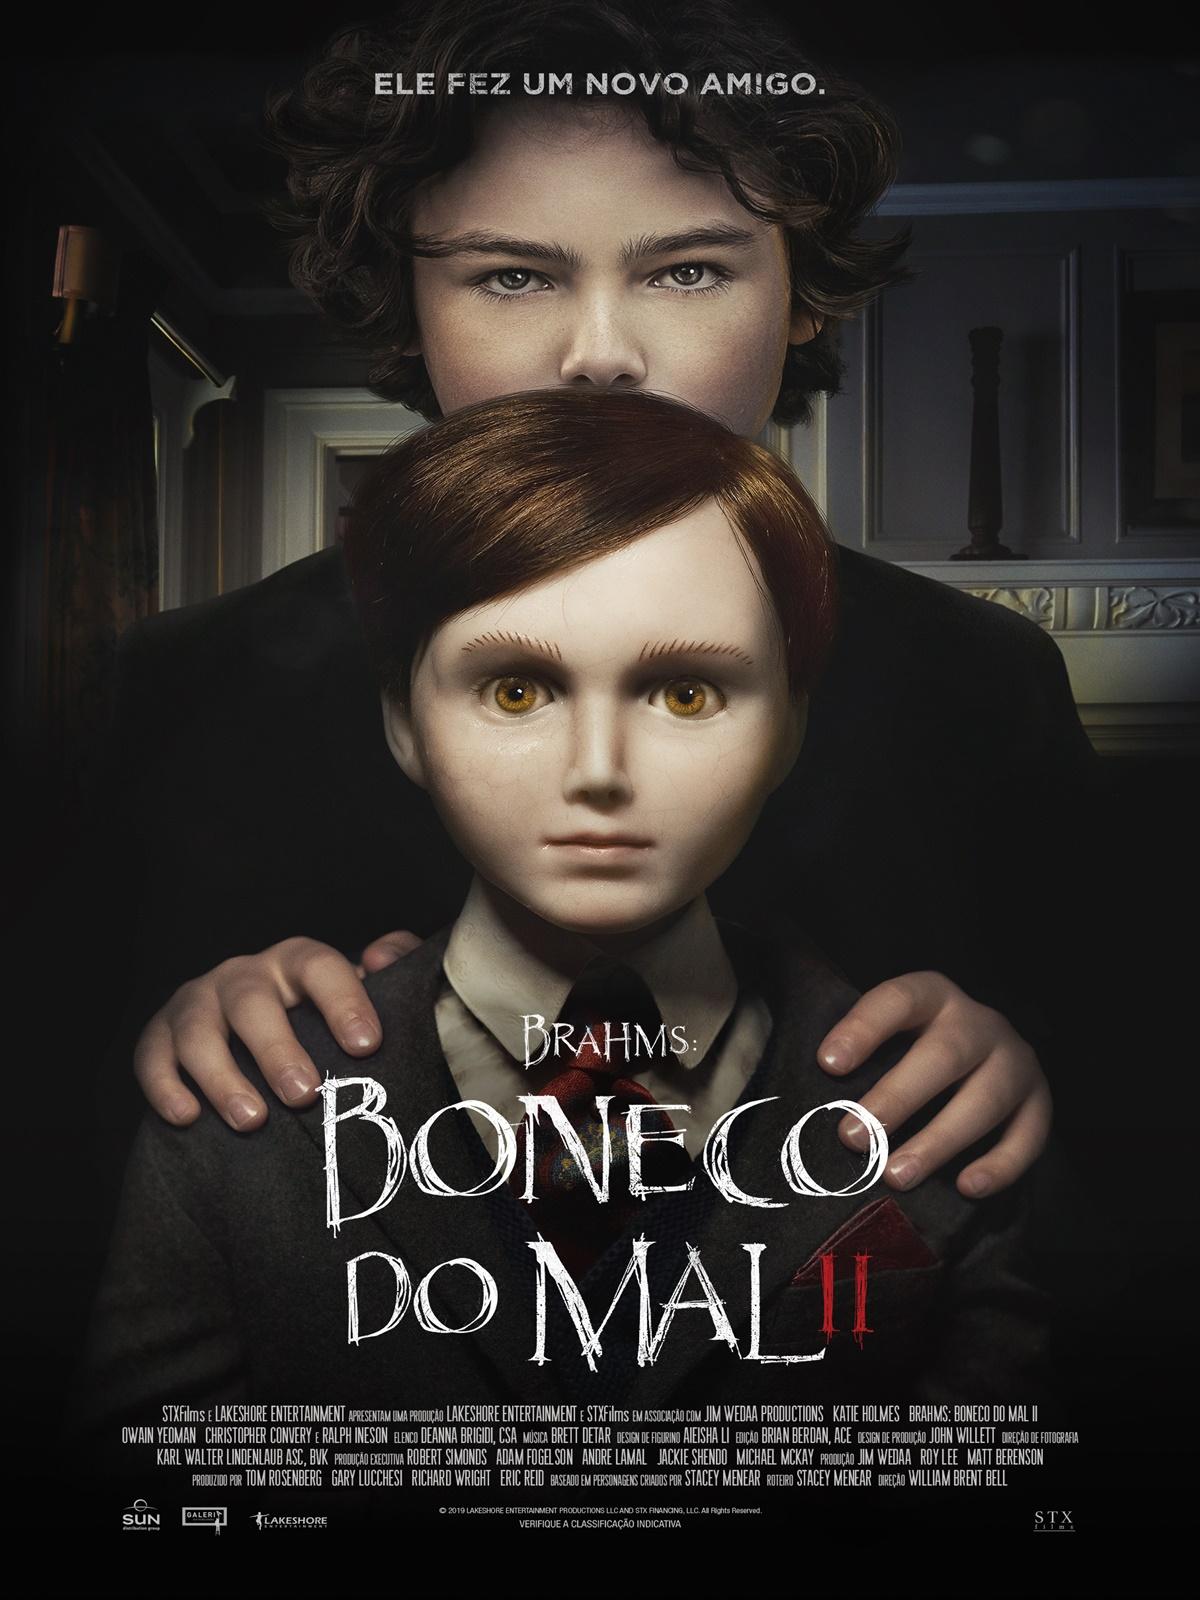 Brahms: Boneco do Mal II - Filme 2020 - AdoroCinema